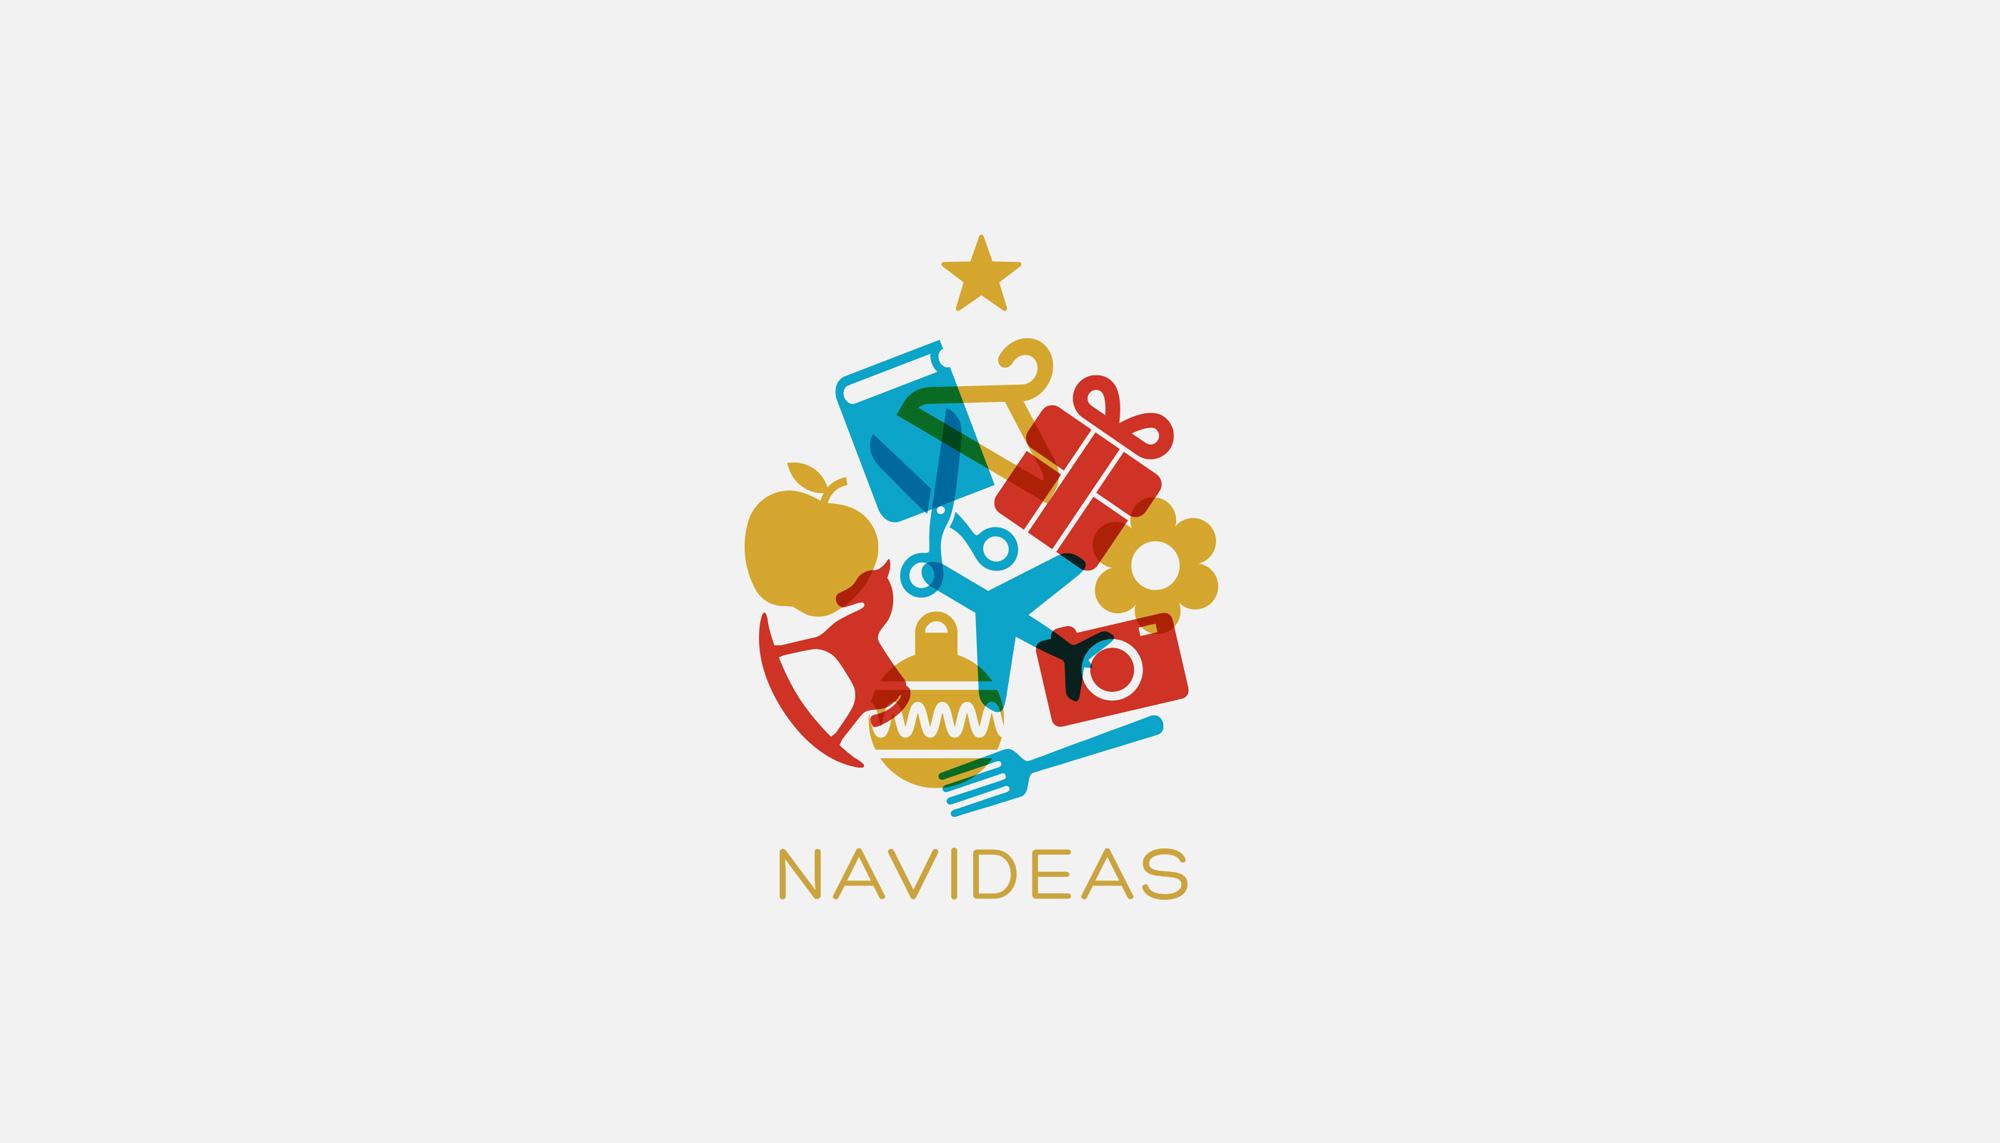 Identidad Corporativa Feria Navideas